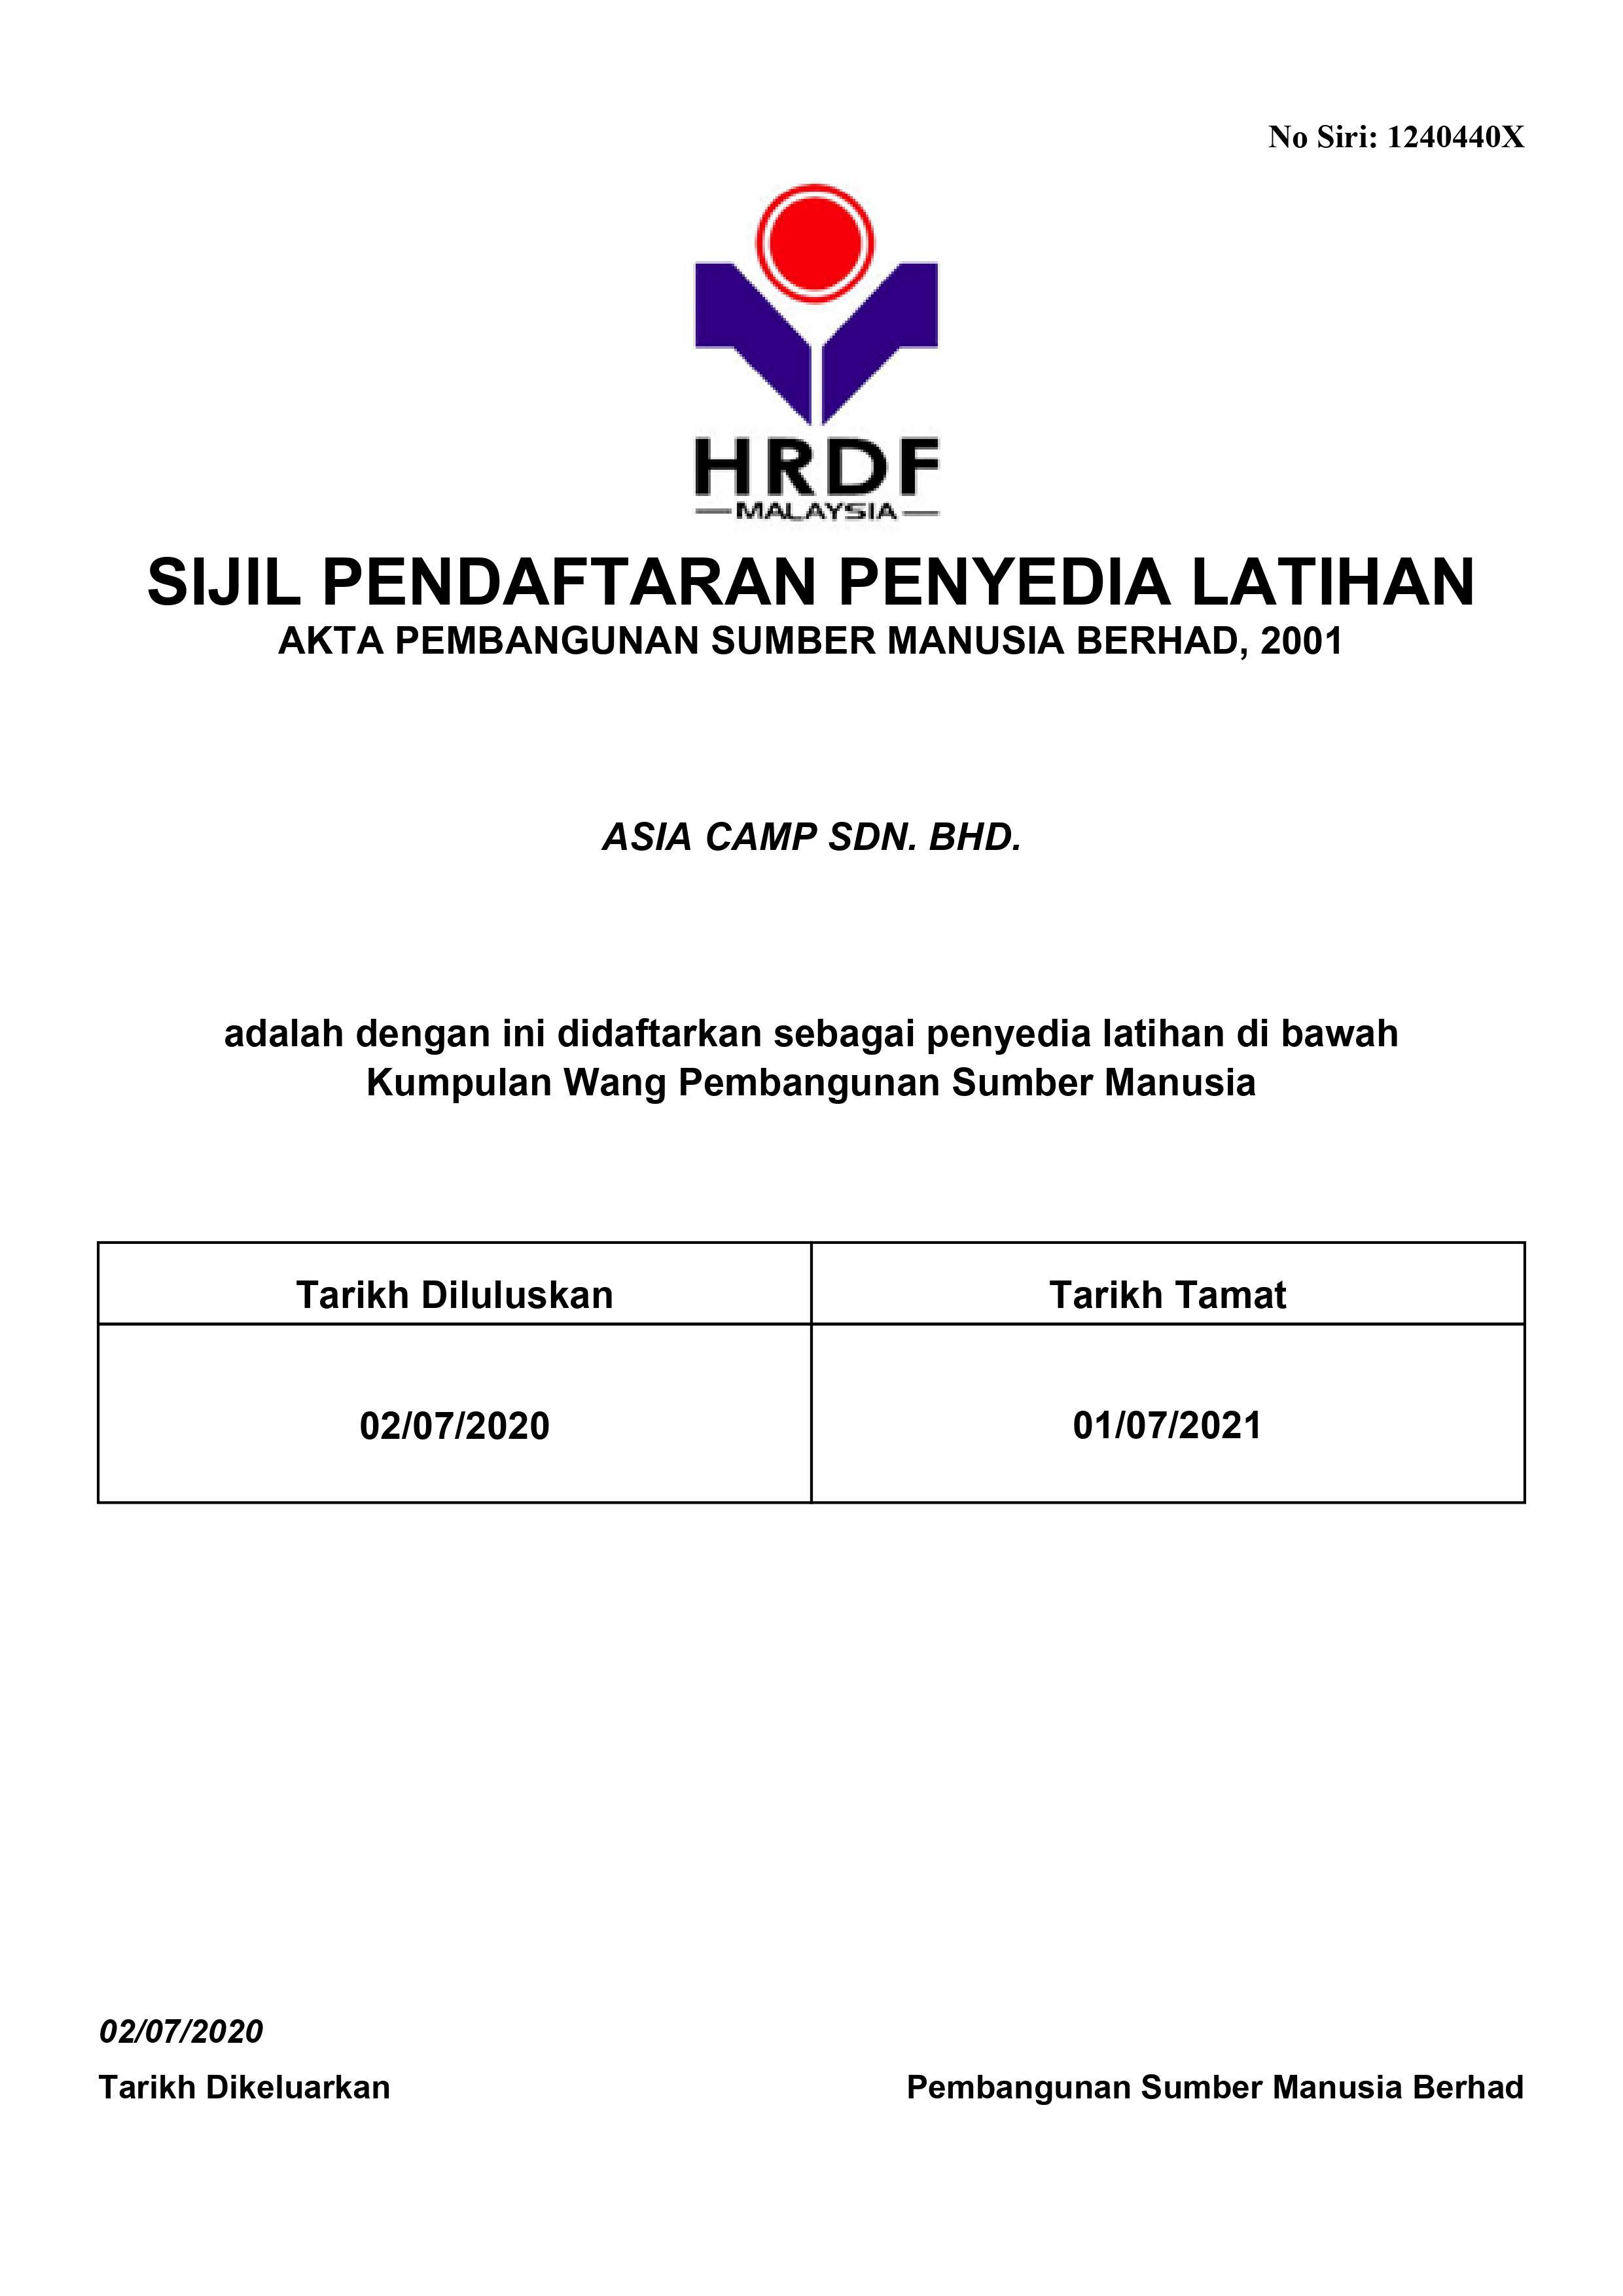 Sijil Pendaftaran Penyedia Latihan PSMB HRDF Claimable